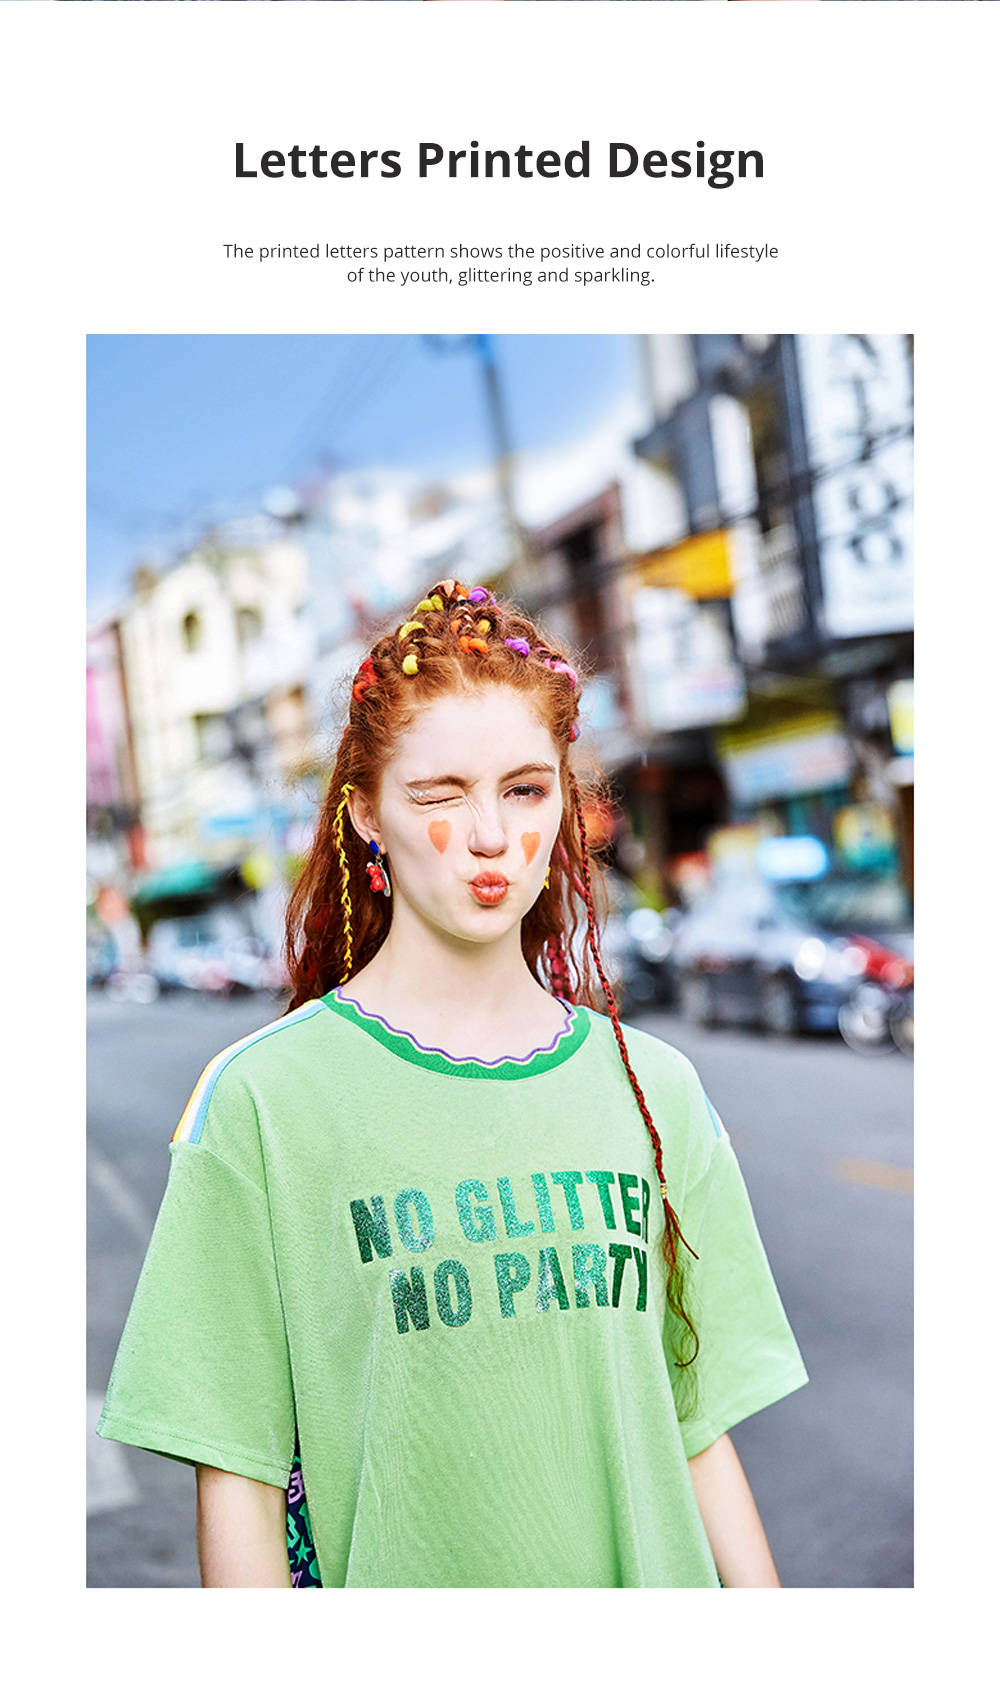 Summer New European Style Fashionable Avocado Green One-piece Fresh Leisure A-shape Dress For Girls Womens 2